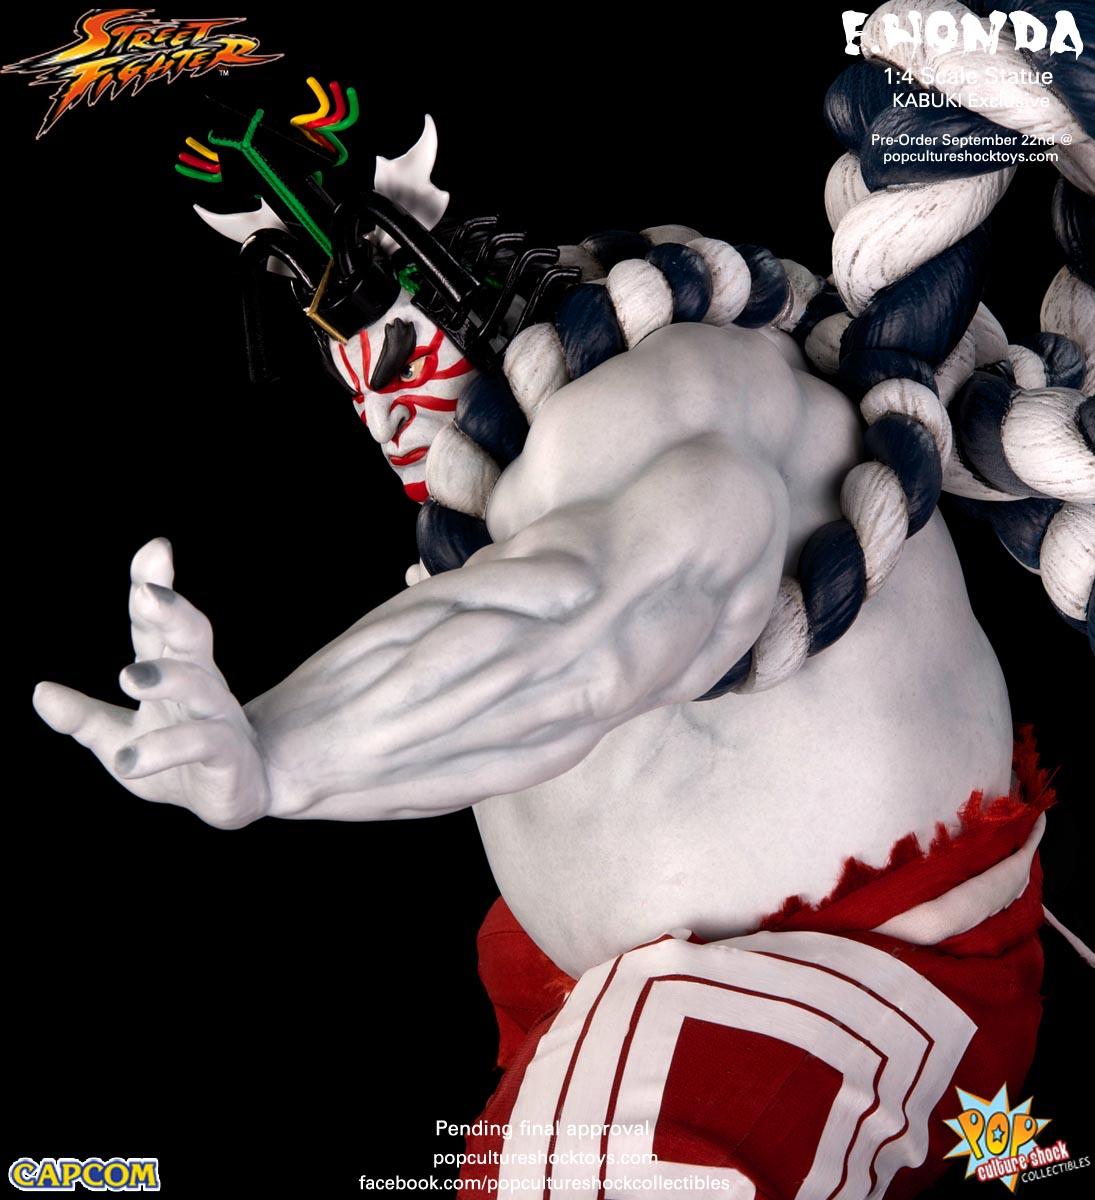 [Pop Culture Shock] Street Fighter: E. Honda 1/4 Statue - Página 3 Street-Fighter-E.-Honda-Kabuki-Statue-022